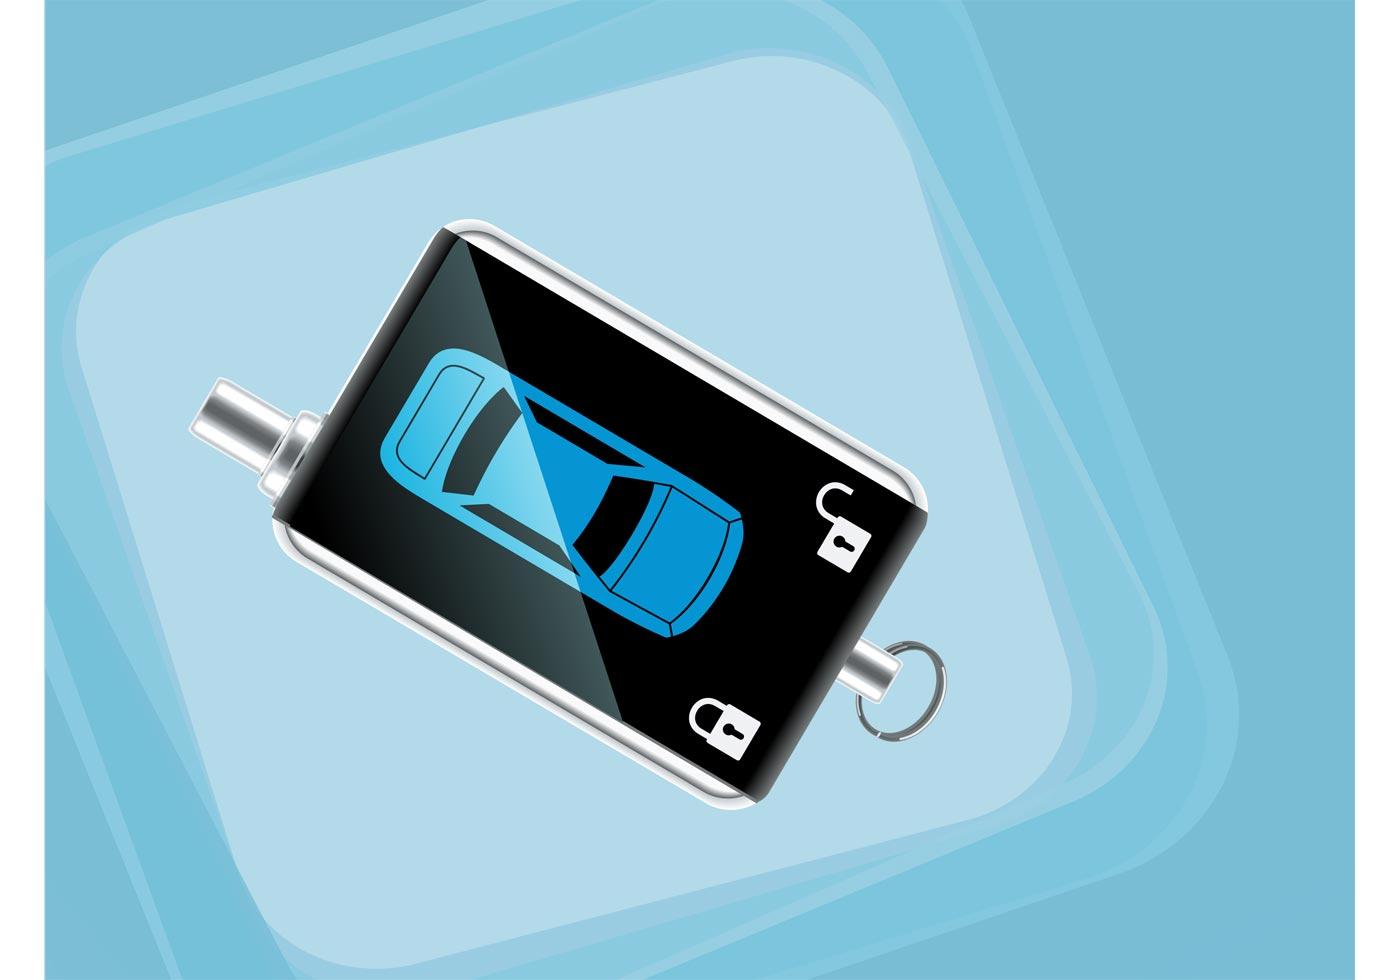 Car Key Remote Download Free Vector Art Stock Graphics